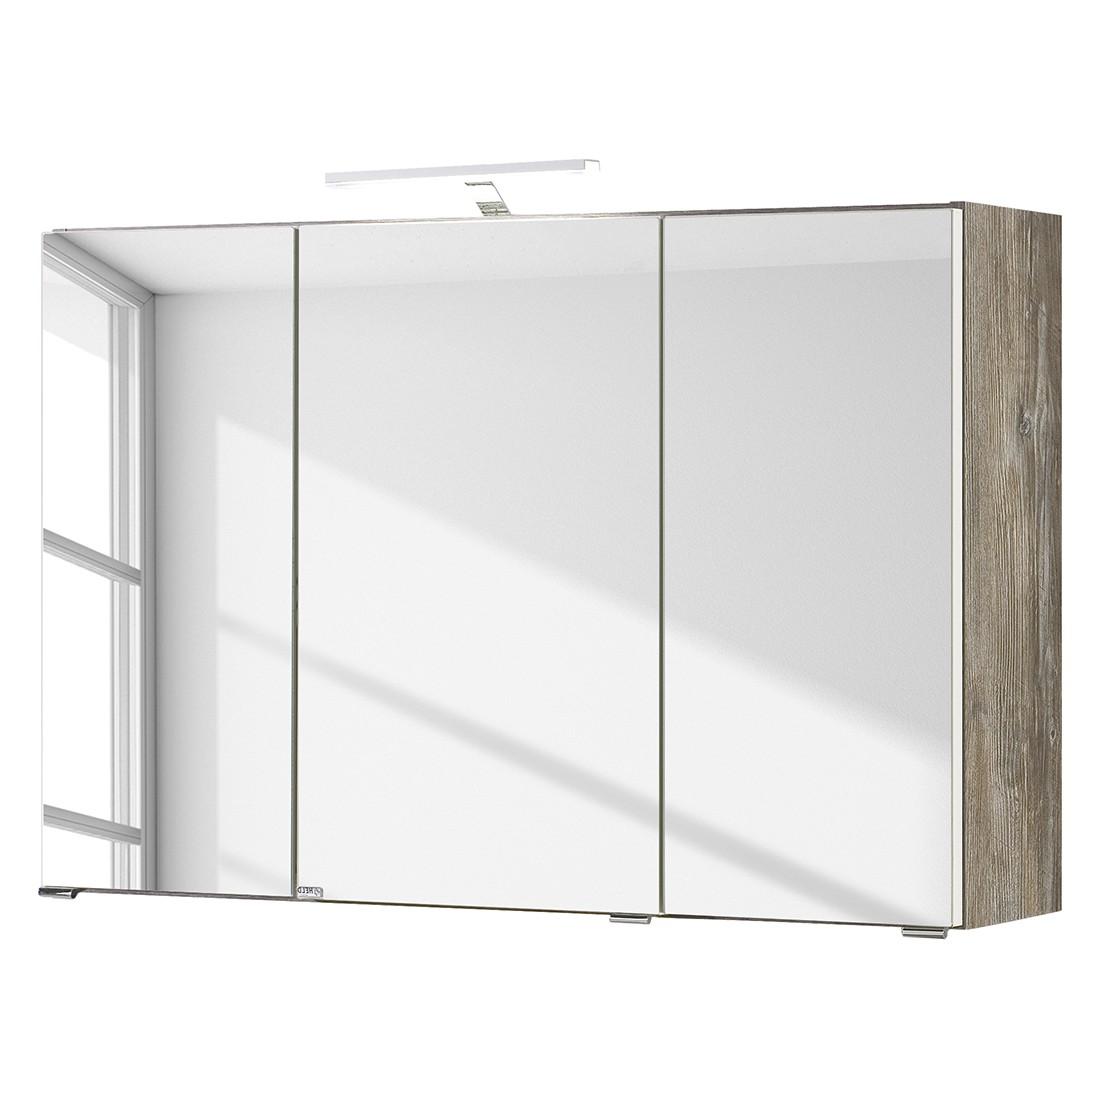 Armoire avec miroir Turda III